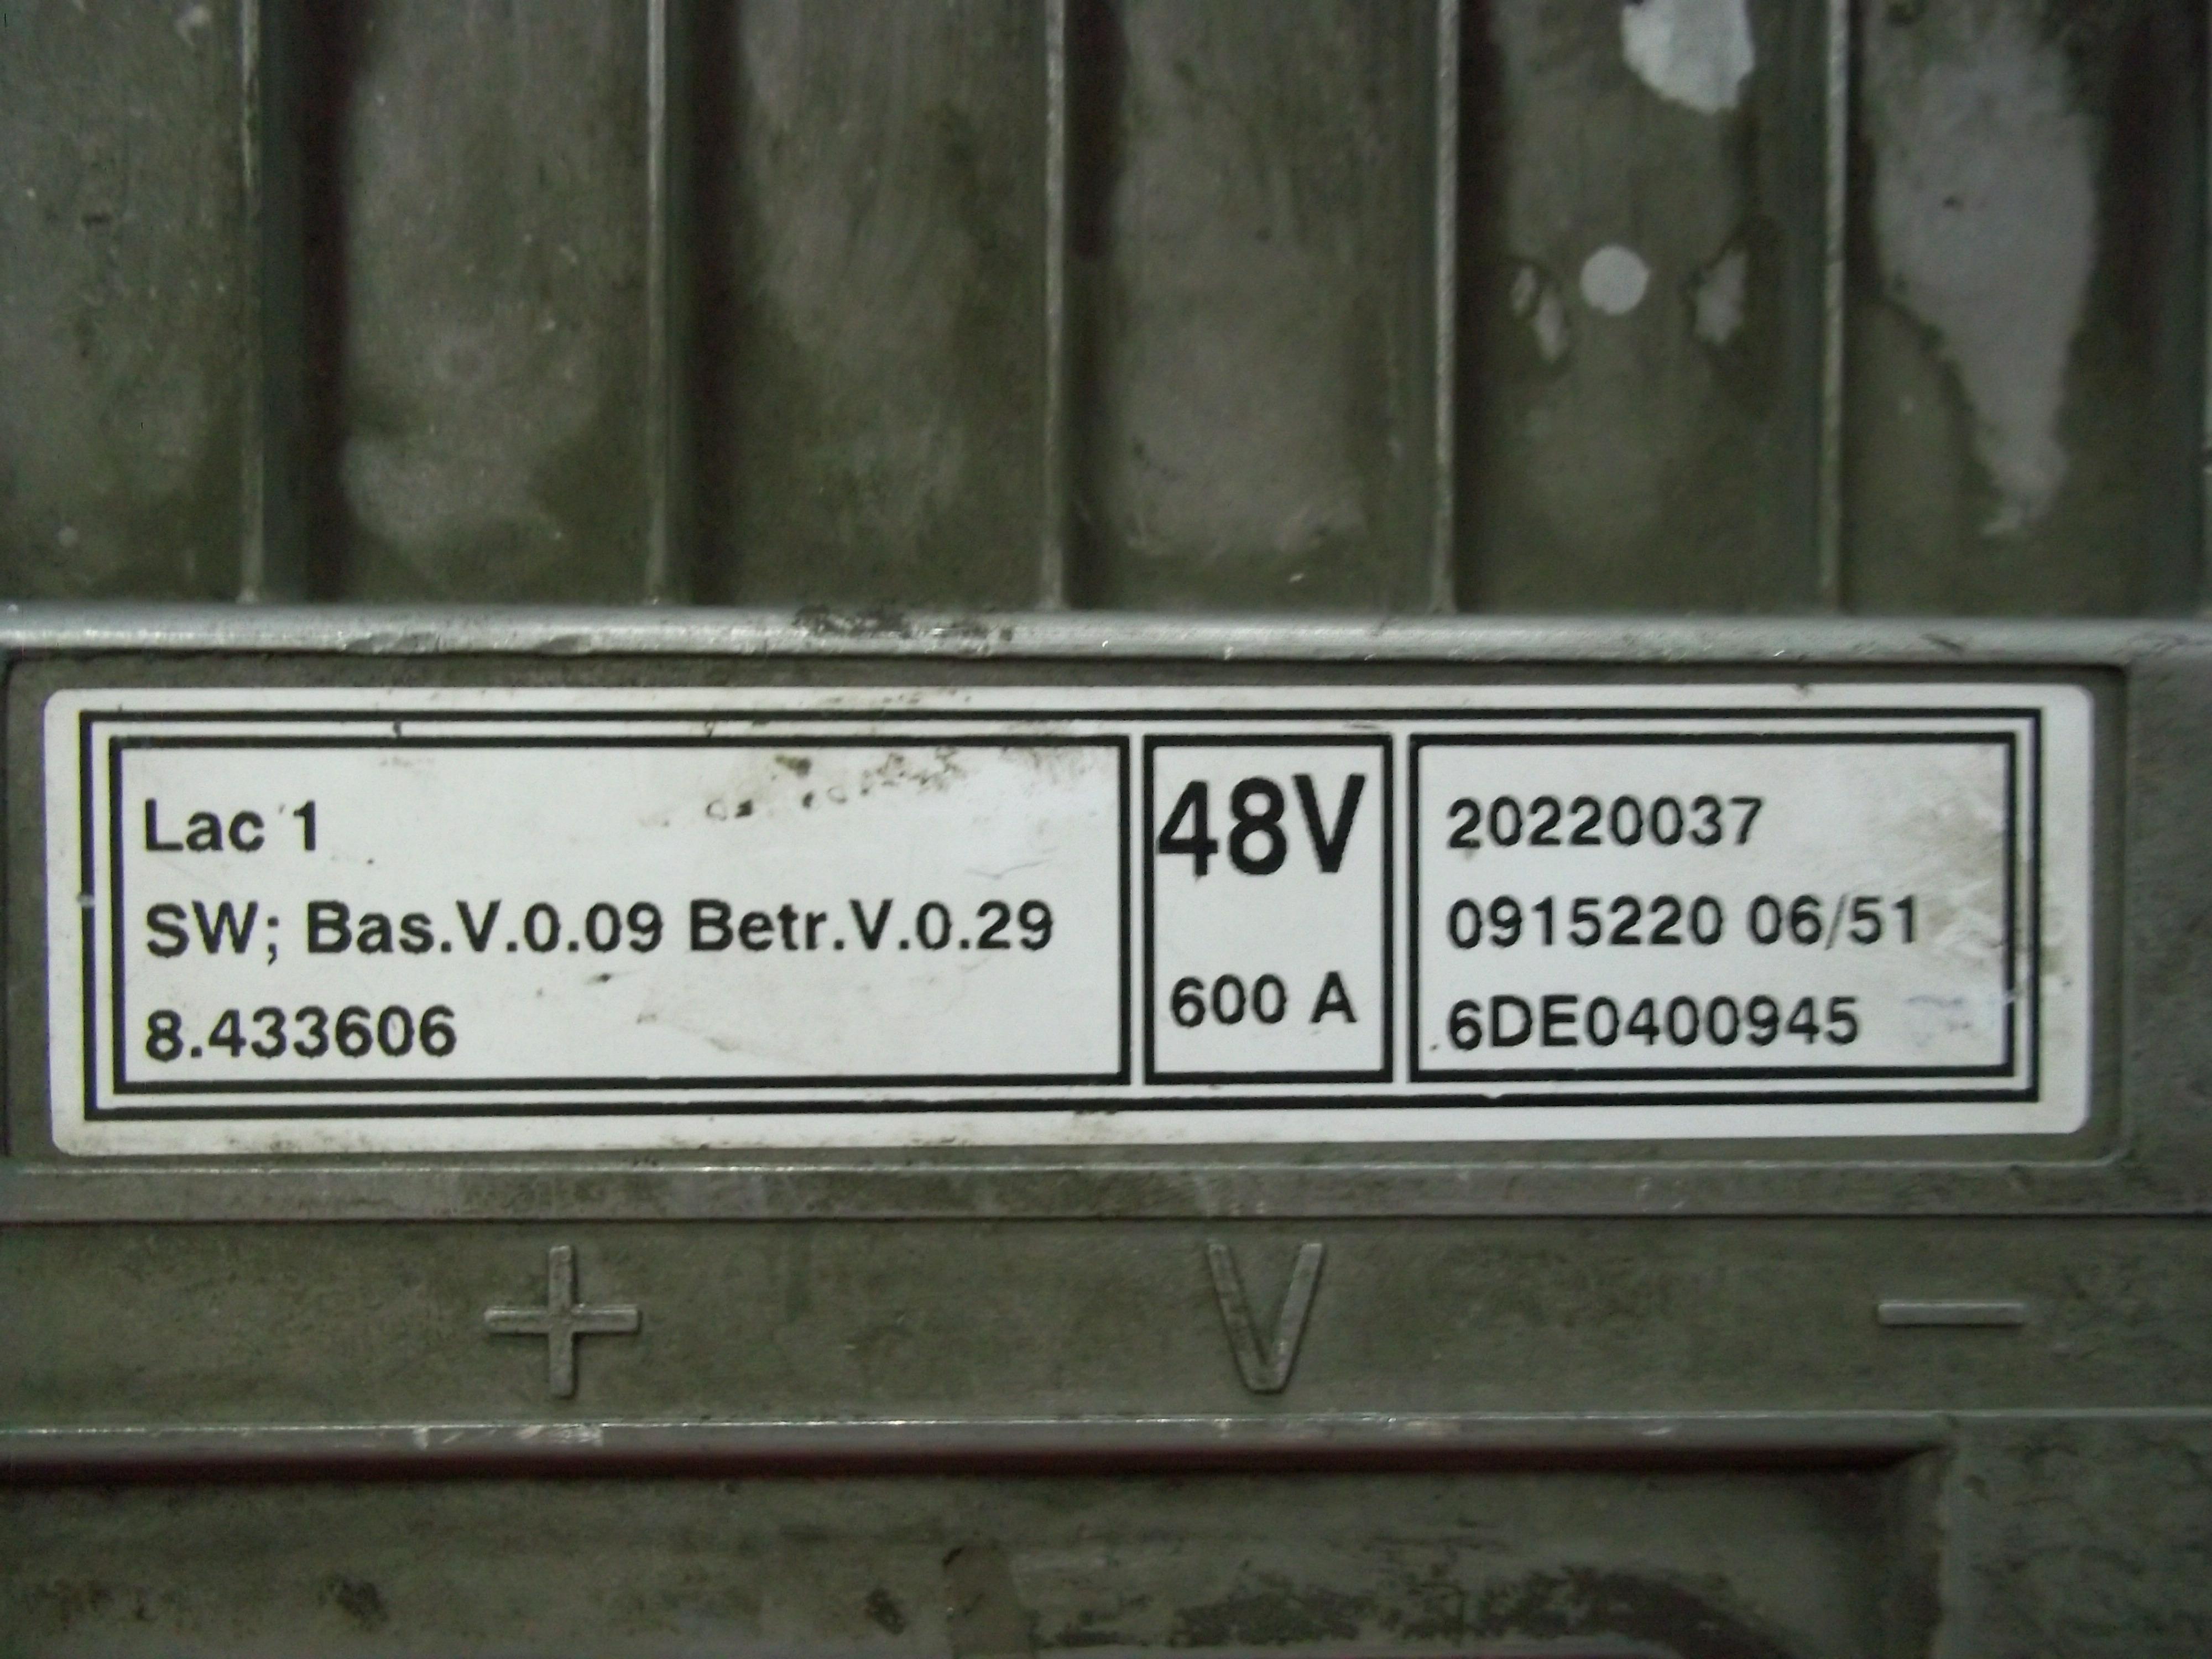 Repair 8433606 LAC 1  LAC 1 in Malaysia, Singapore, Thailand, Indonesia